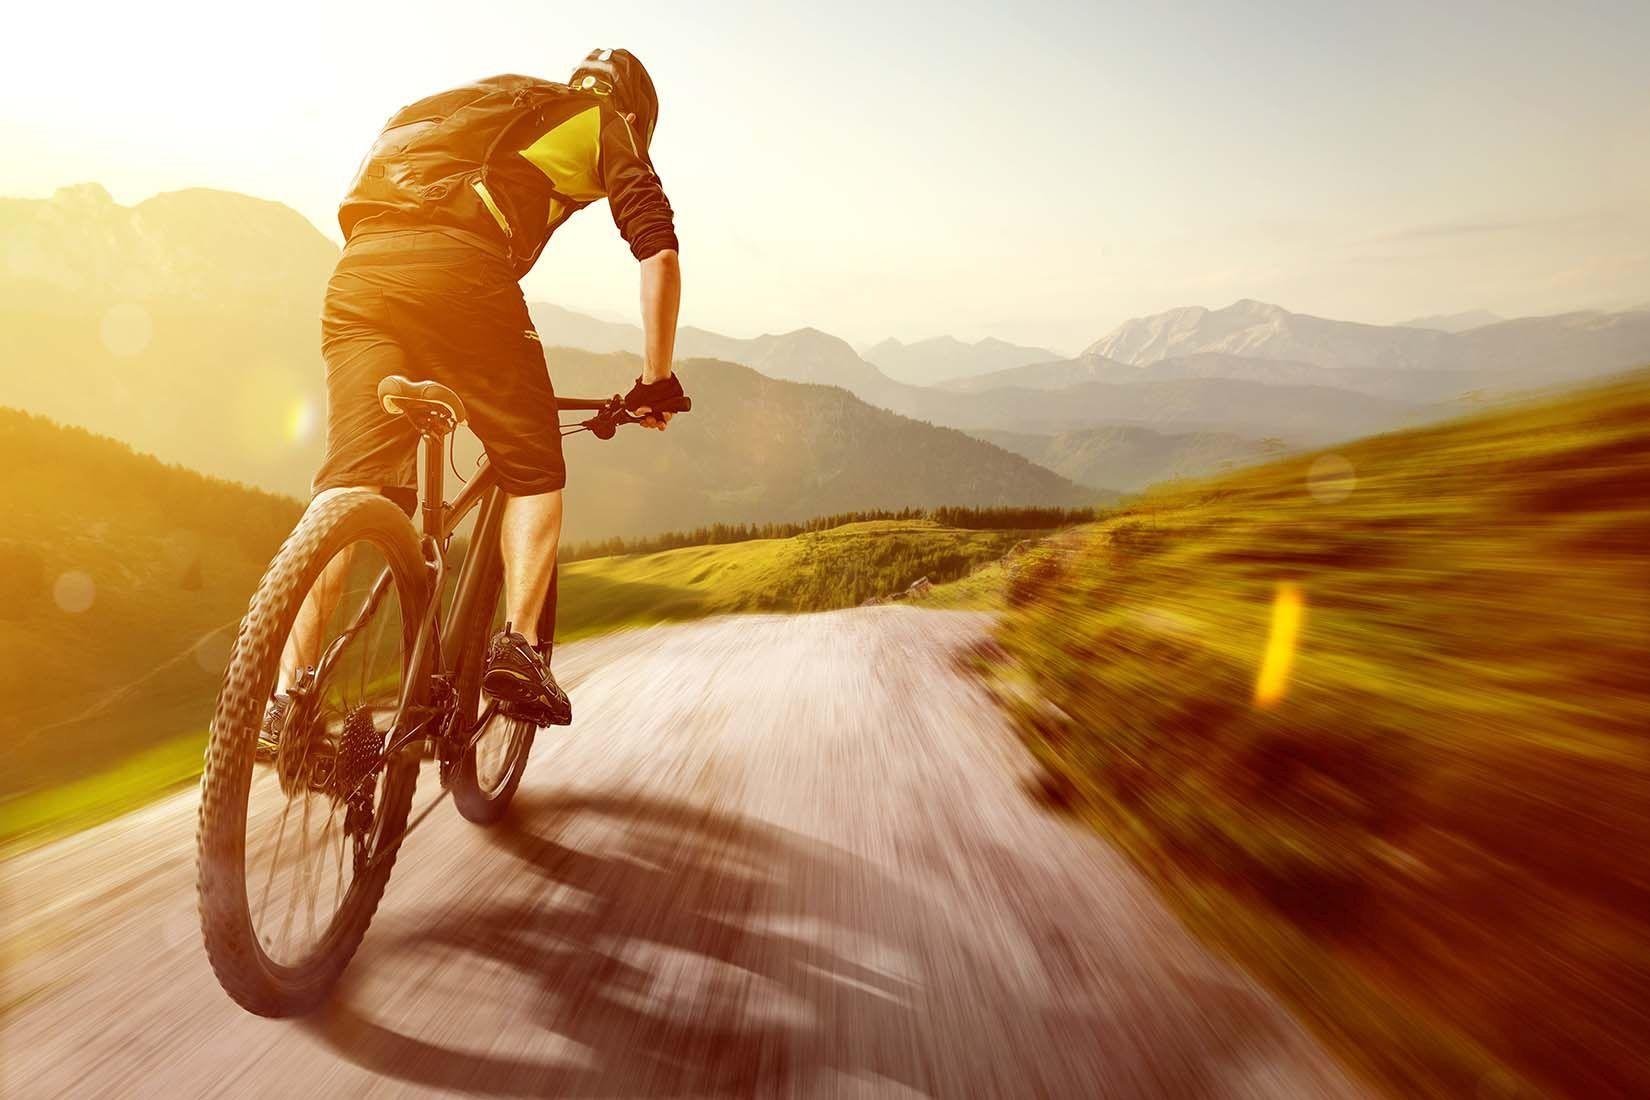 Sworke sunglasses: outdoor biking 07 1650x1100